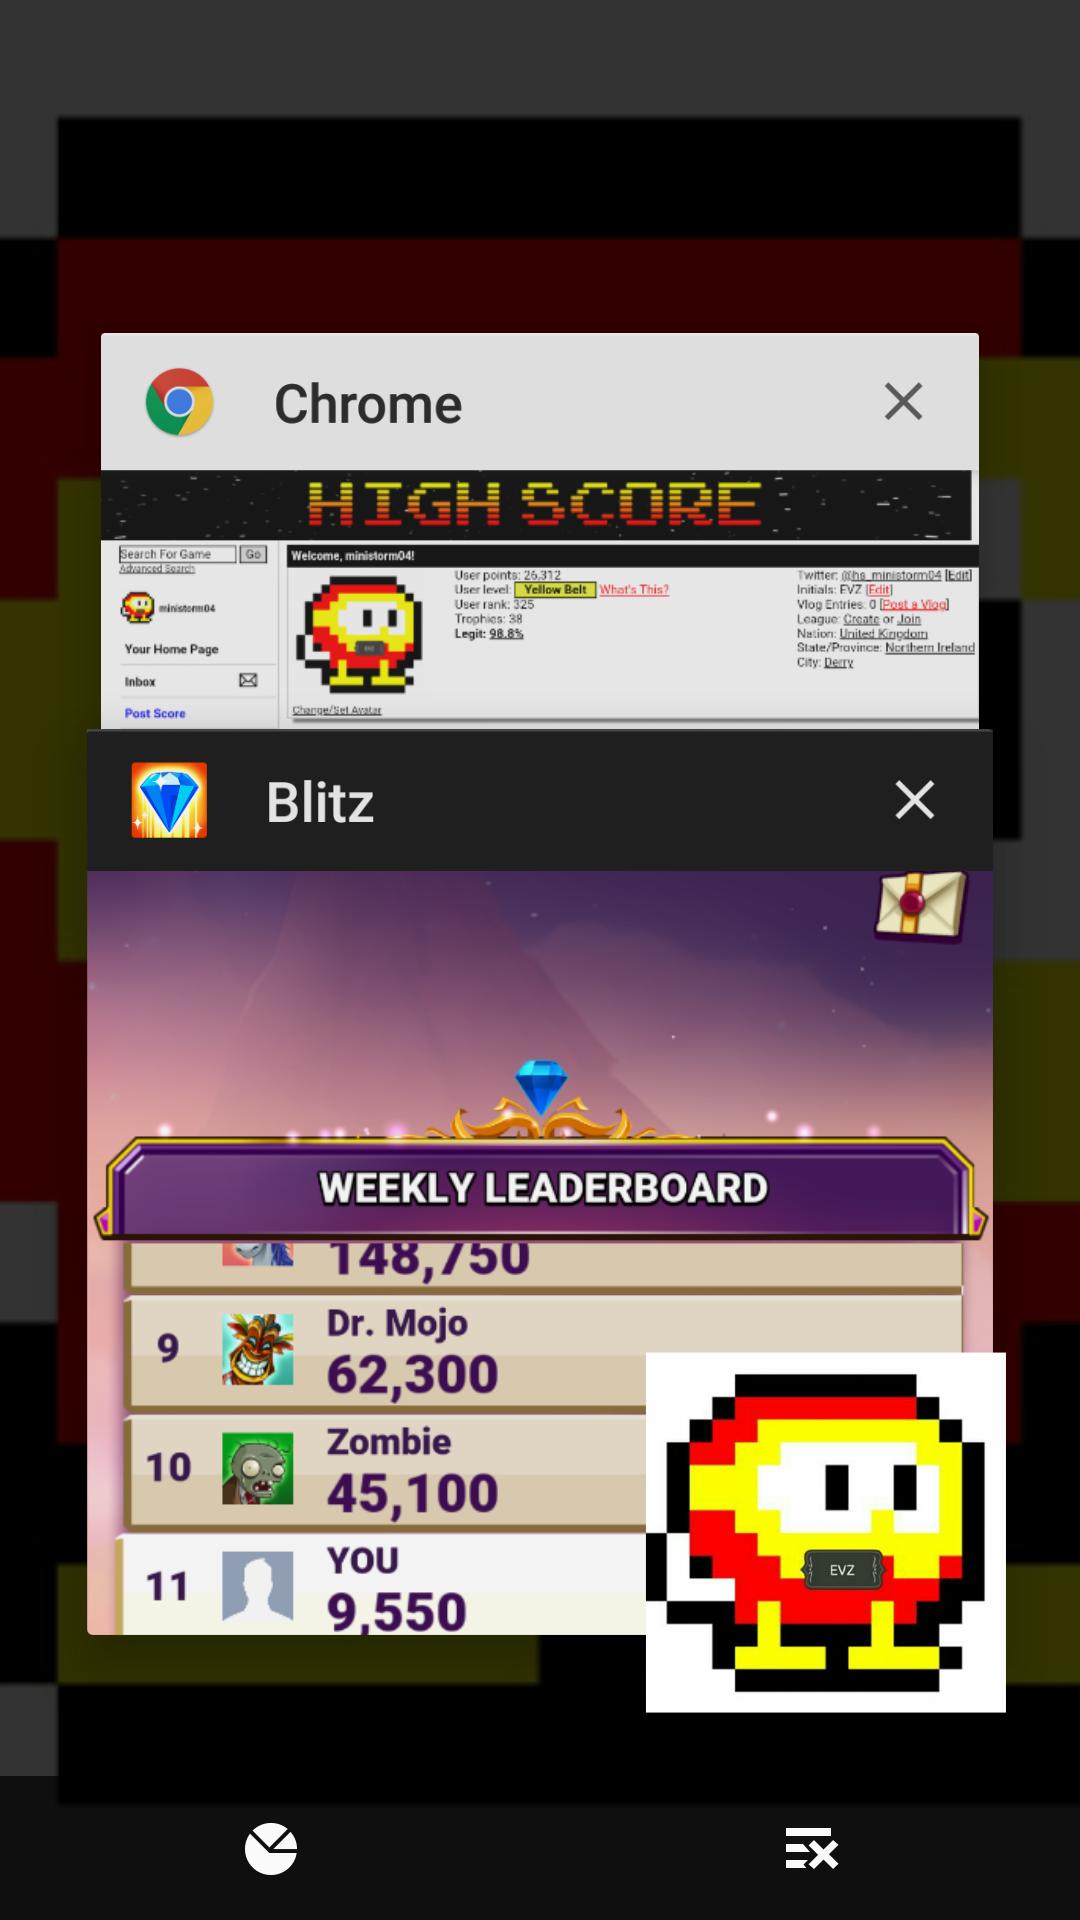 Bejeweled Blitz 9,550 points